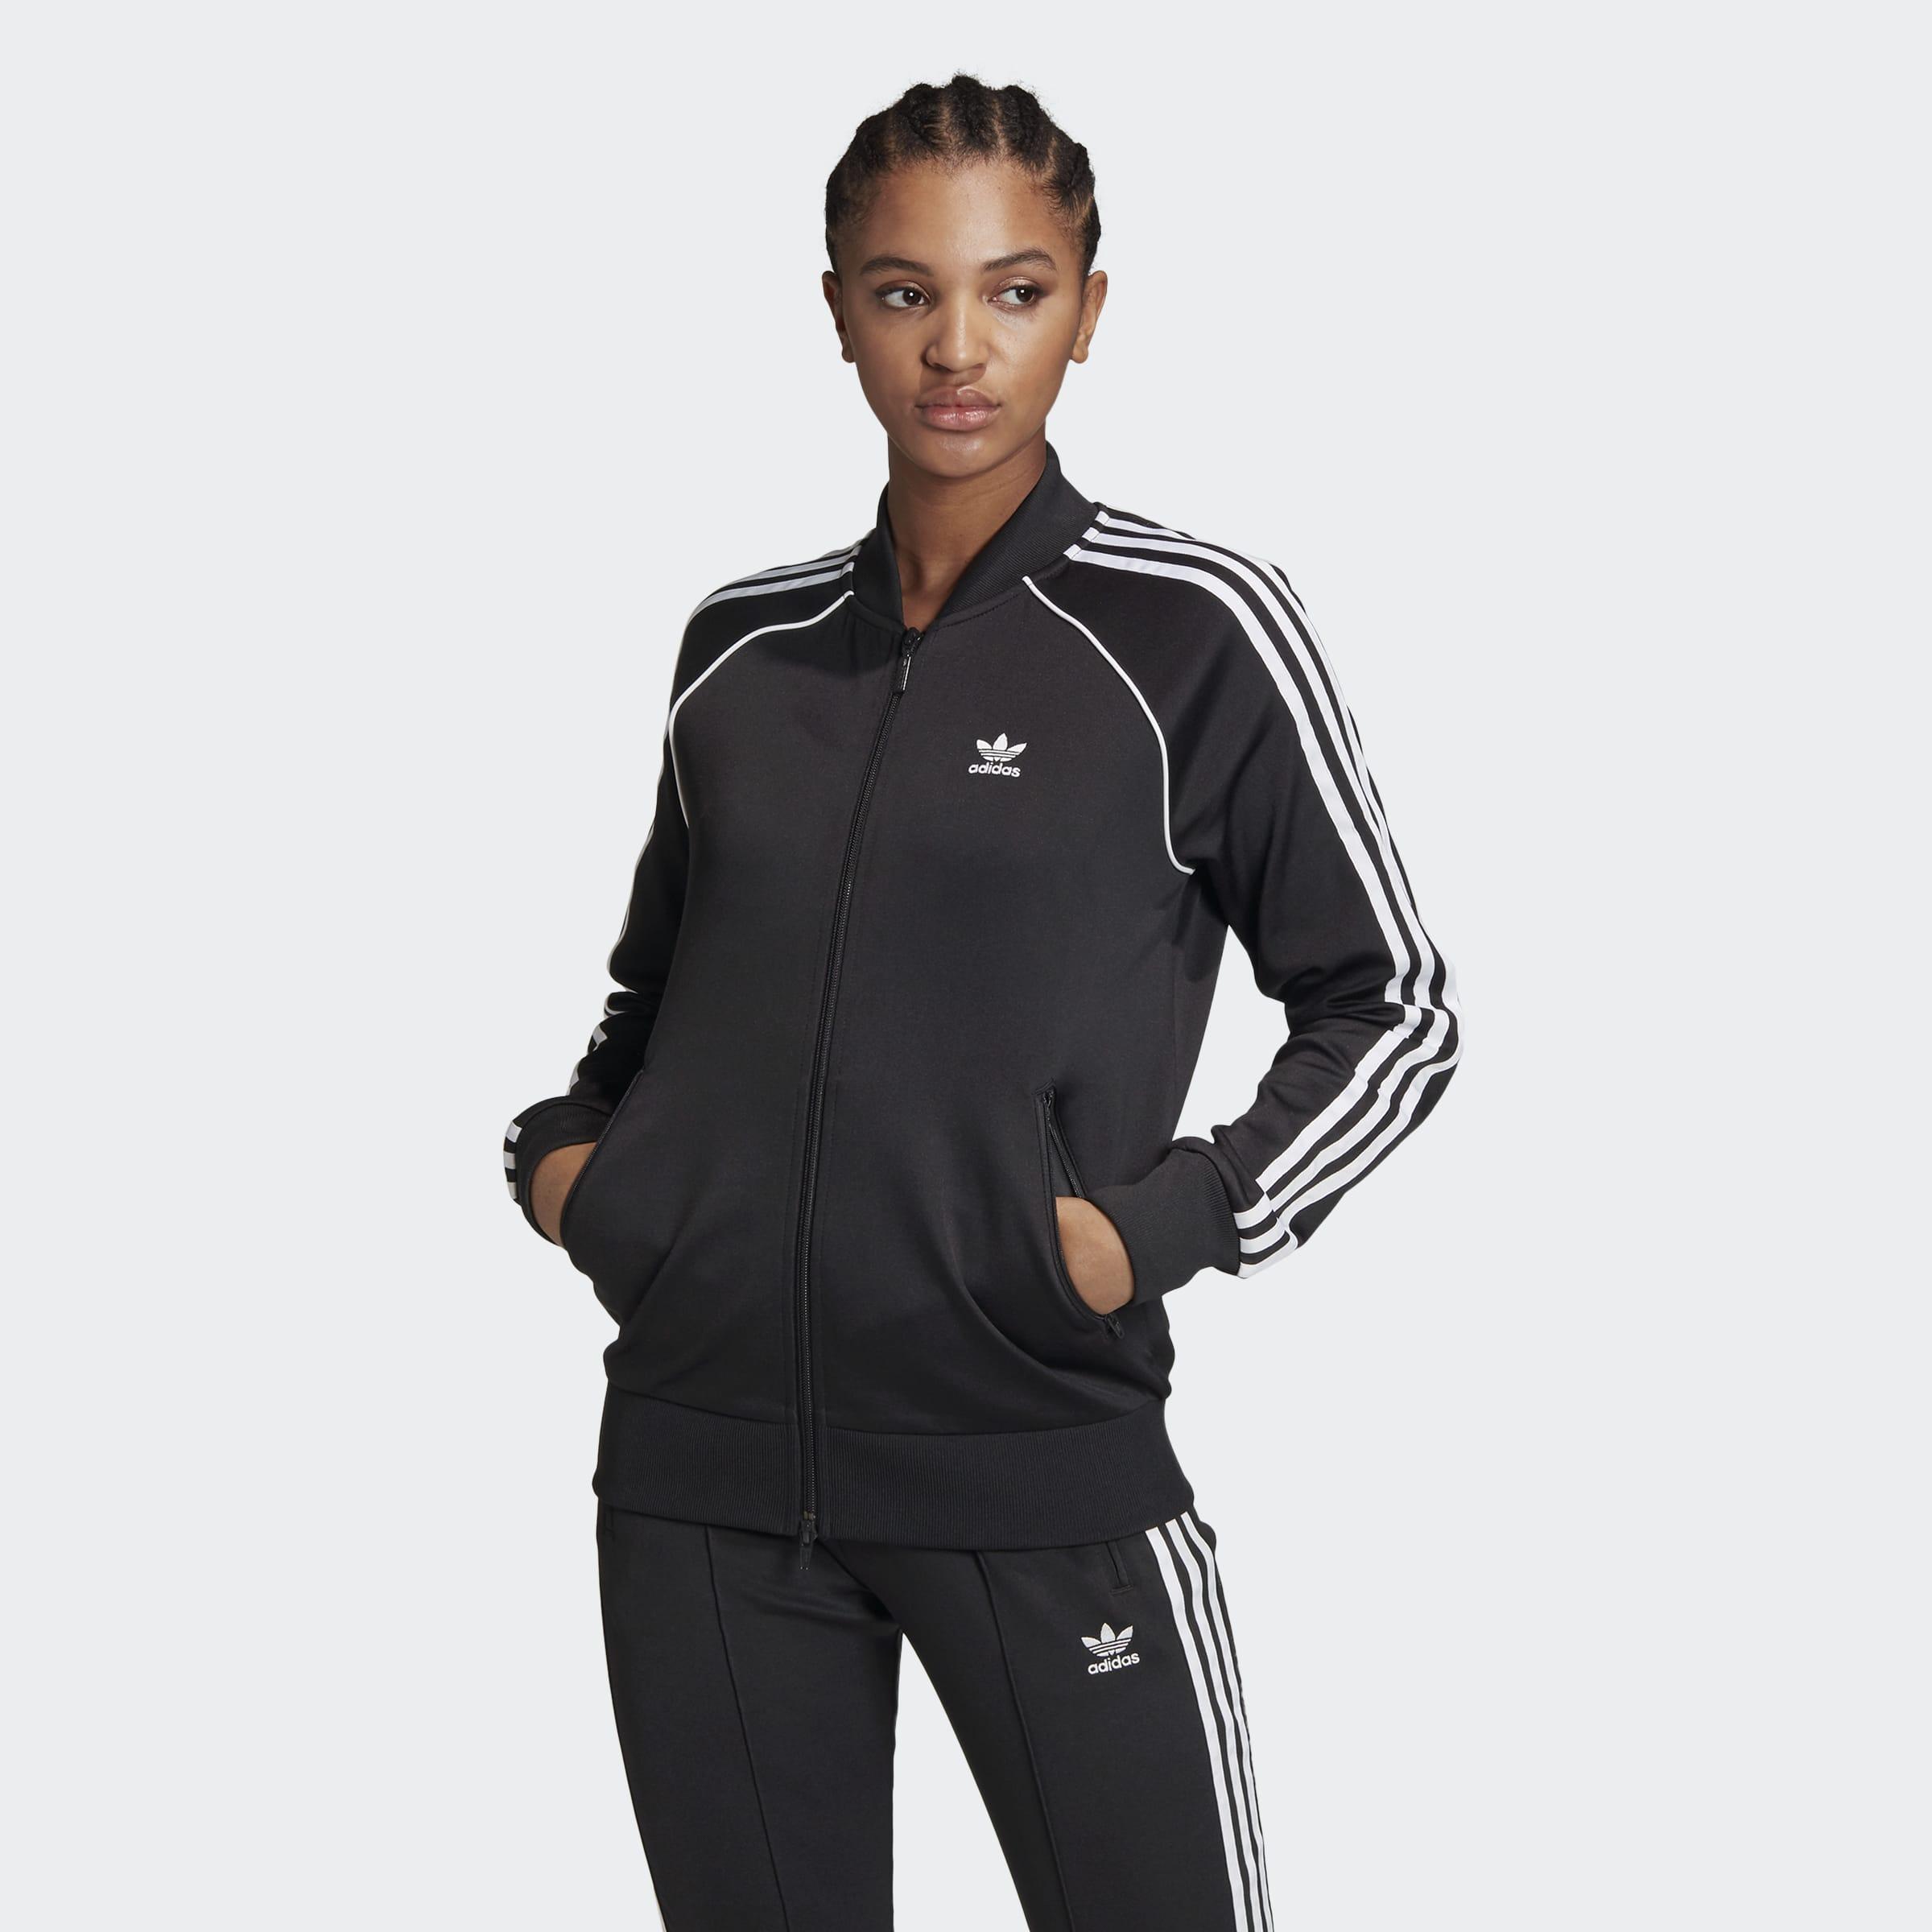 adidas originals -  Trainingsjacke SUPERSTAR PB ADICOLOR PRIMEBLUE ORIGINALS REGULAR WOMENS